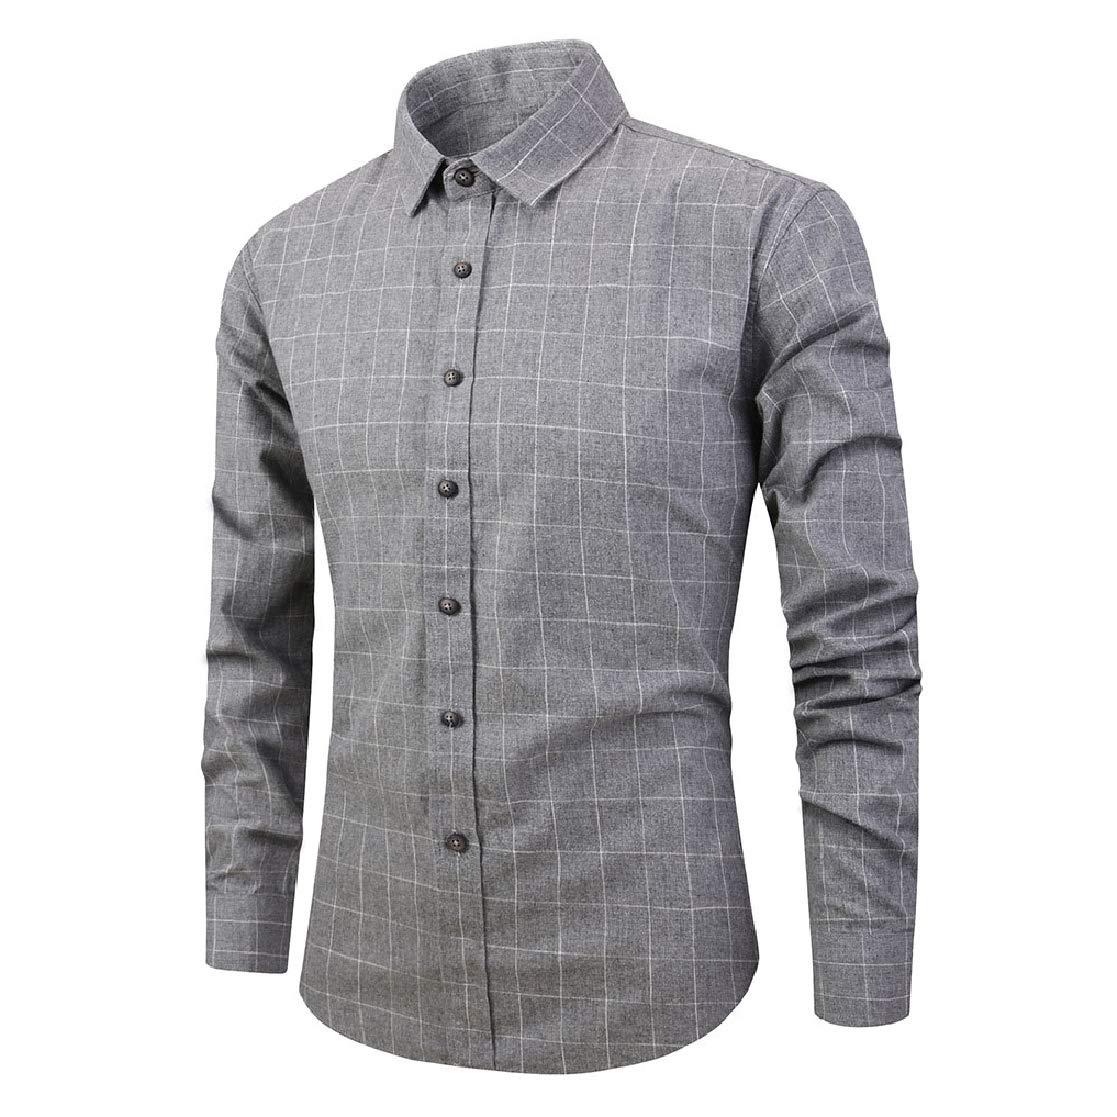 YUNY Mens Plaid Lapel Collar Trim-Fit Casual Long Sleeve Long-Sleeve Shirts Gray 2XL